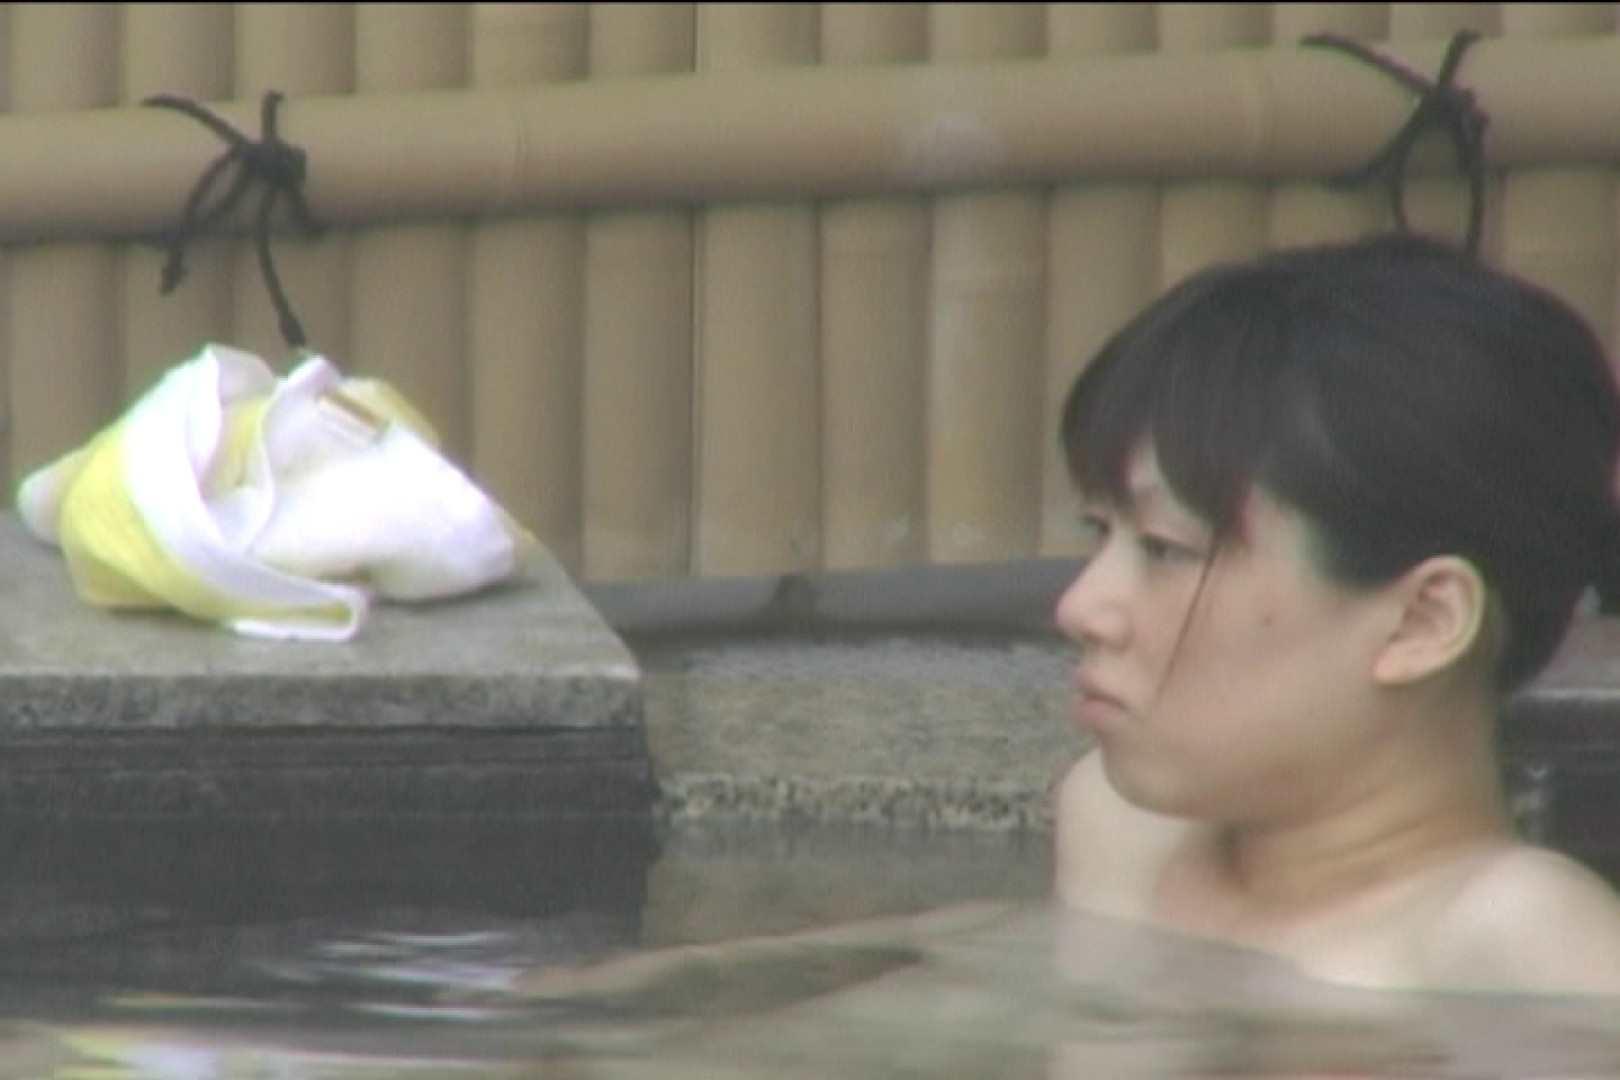 Aquaな露天風呂Vol.121 盗撮映像  23Pix 10